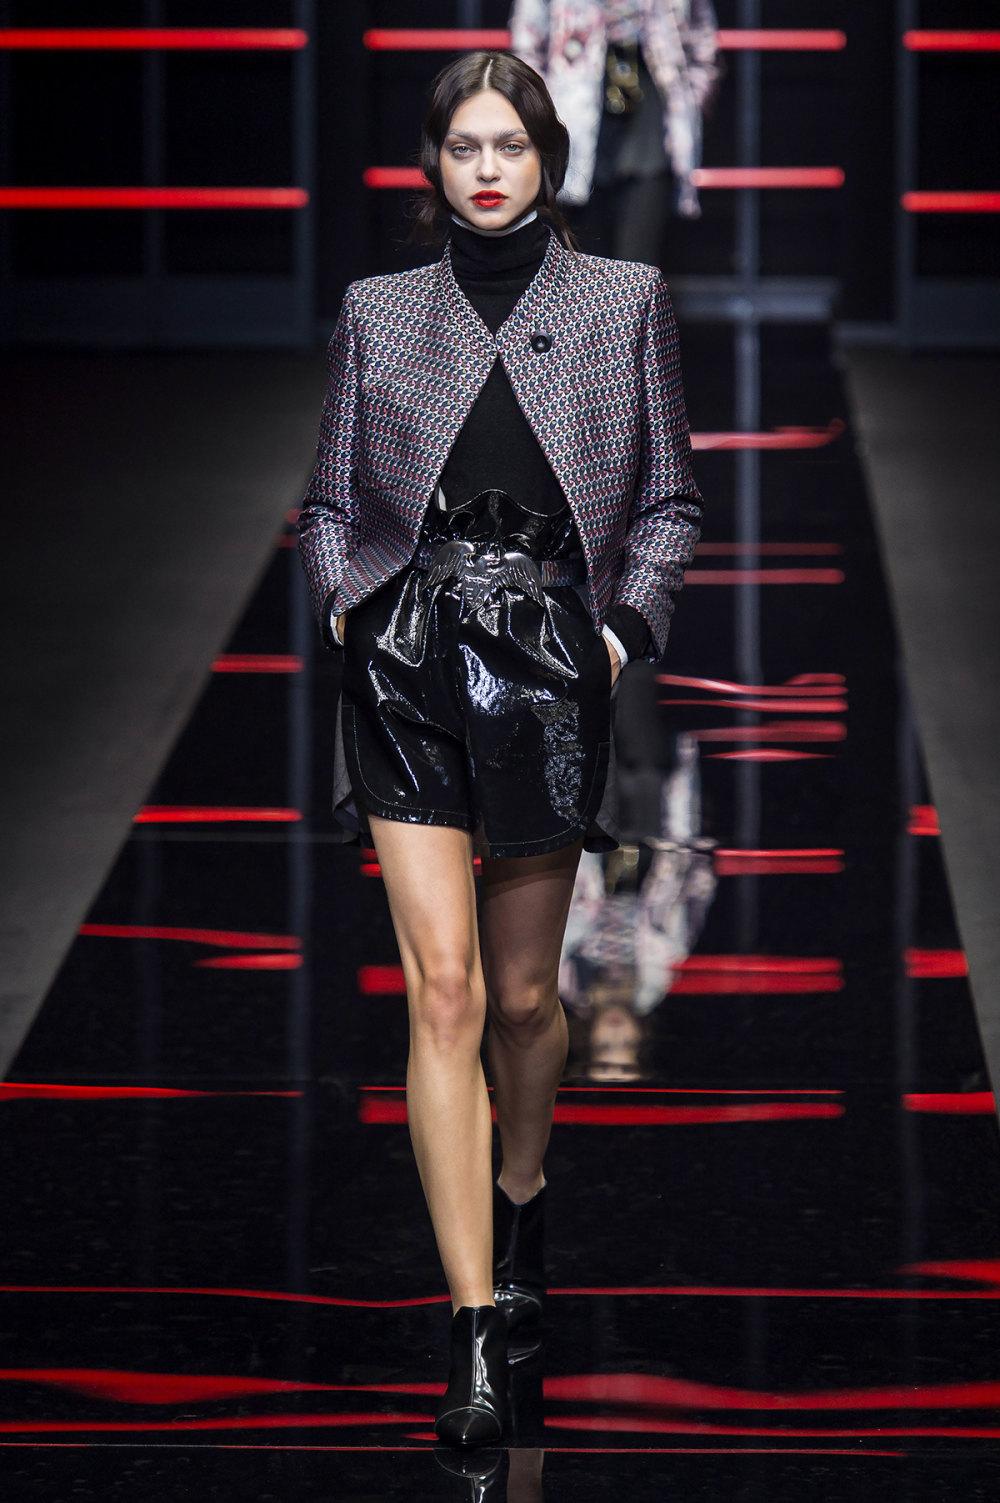 Emporio Armani时装系列畅的裤子带有柔滑裙子的鸡尾酒礼服-40.jpg